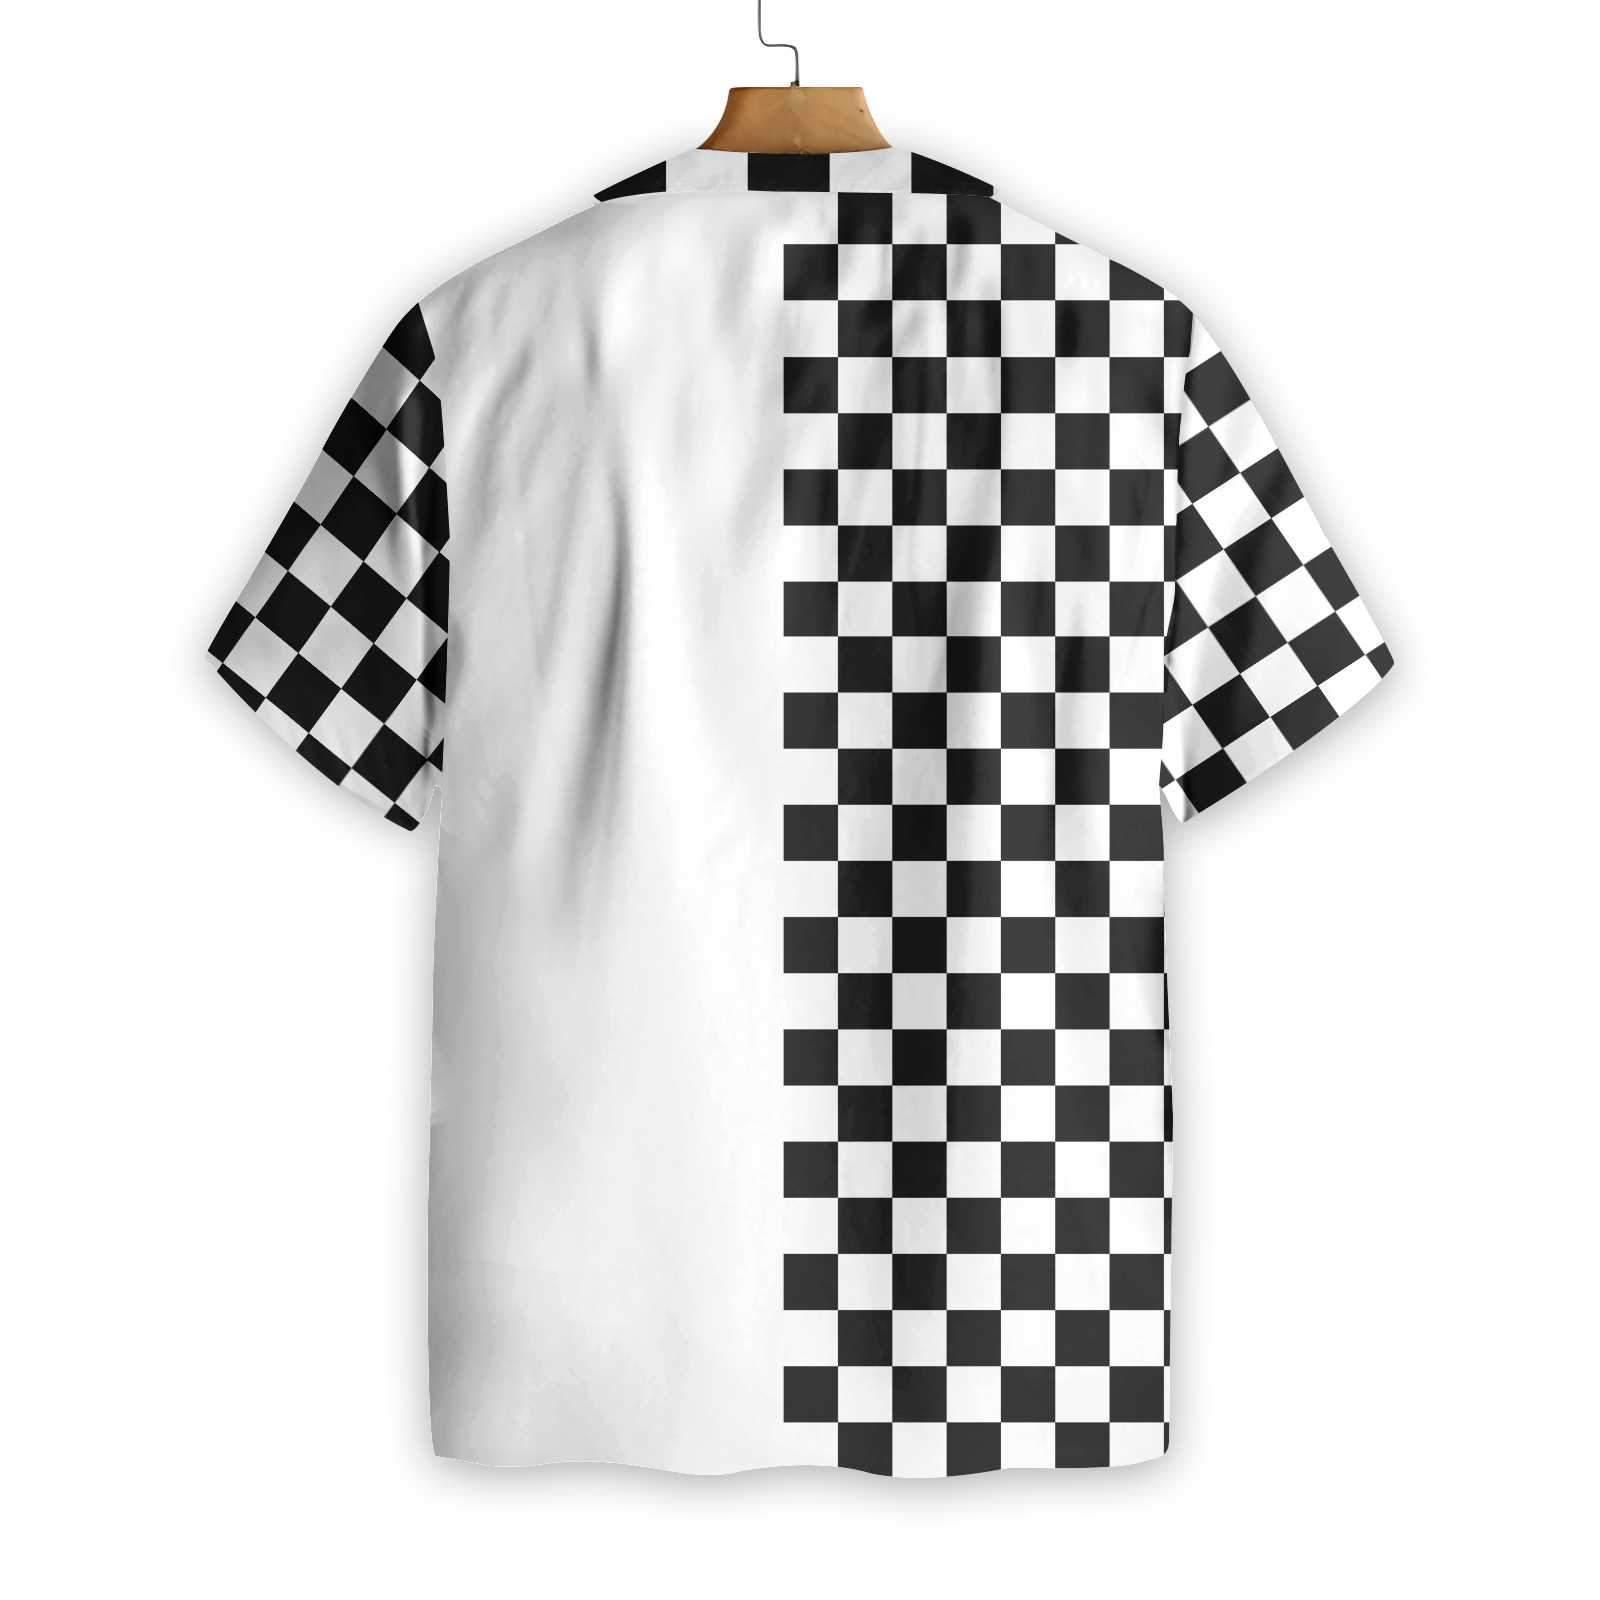 Personalized Checkboard Style Golf Hawaiian Shirt 2